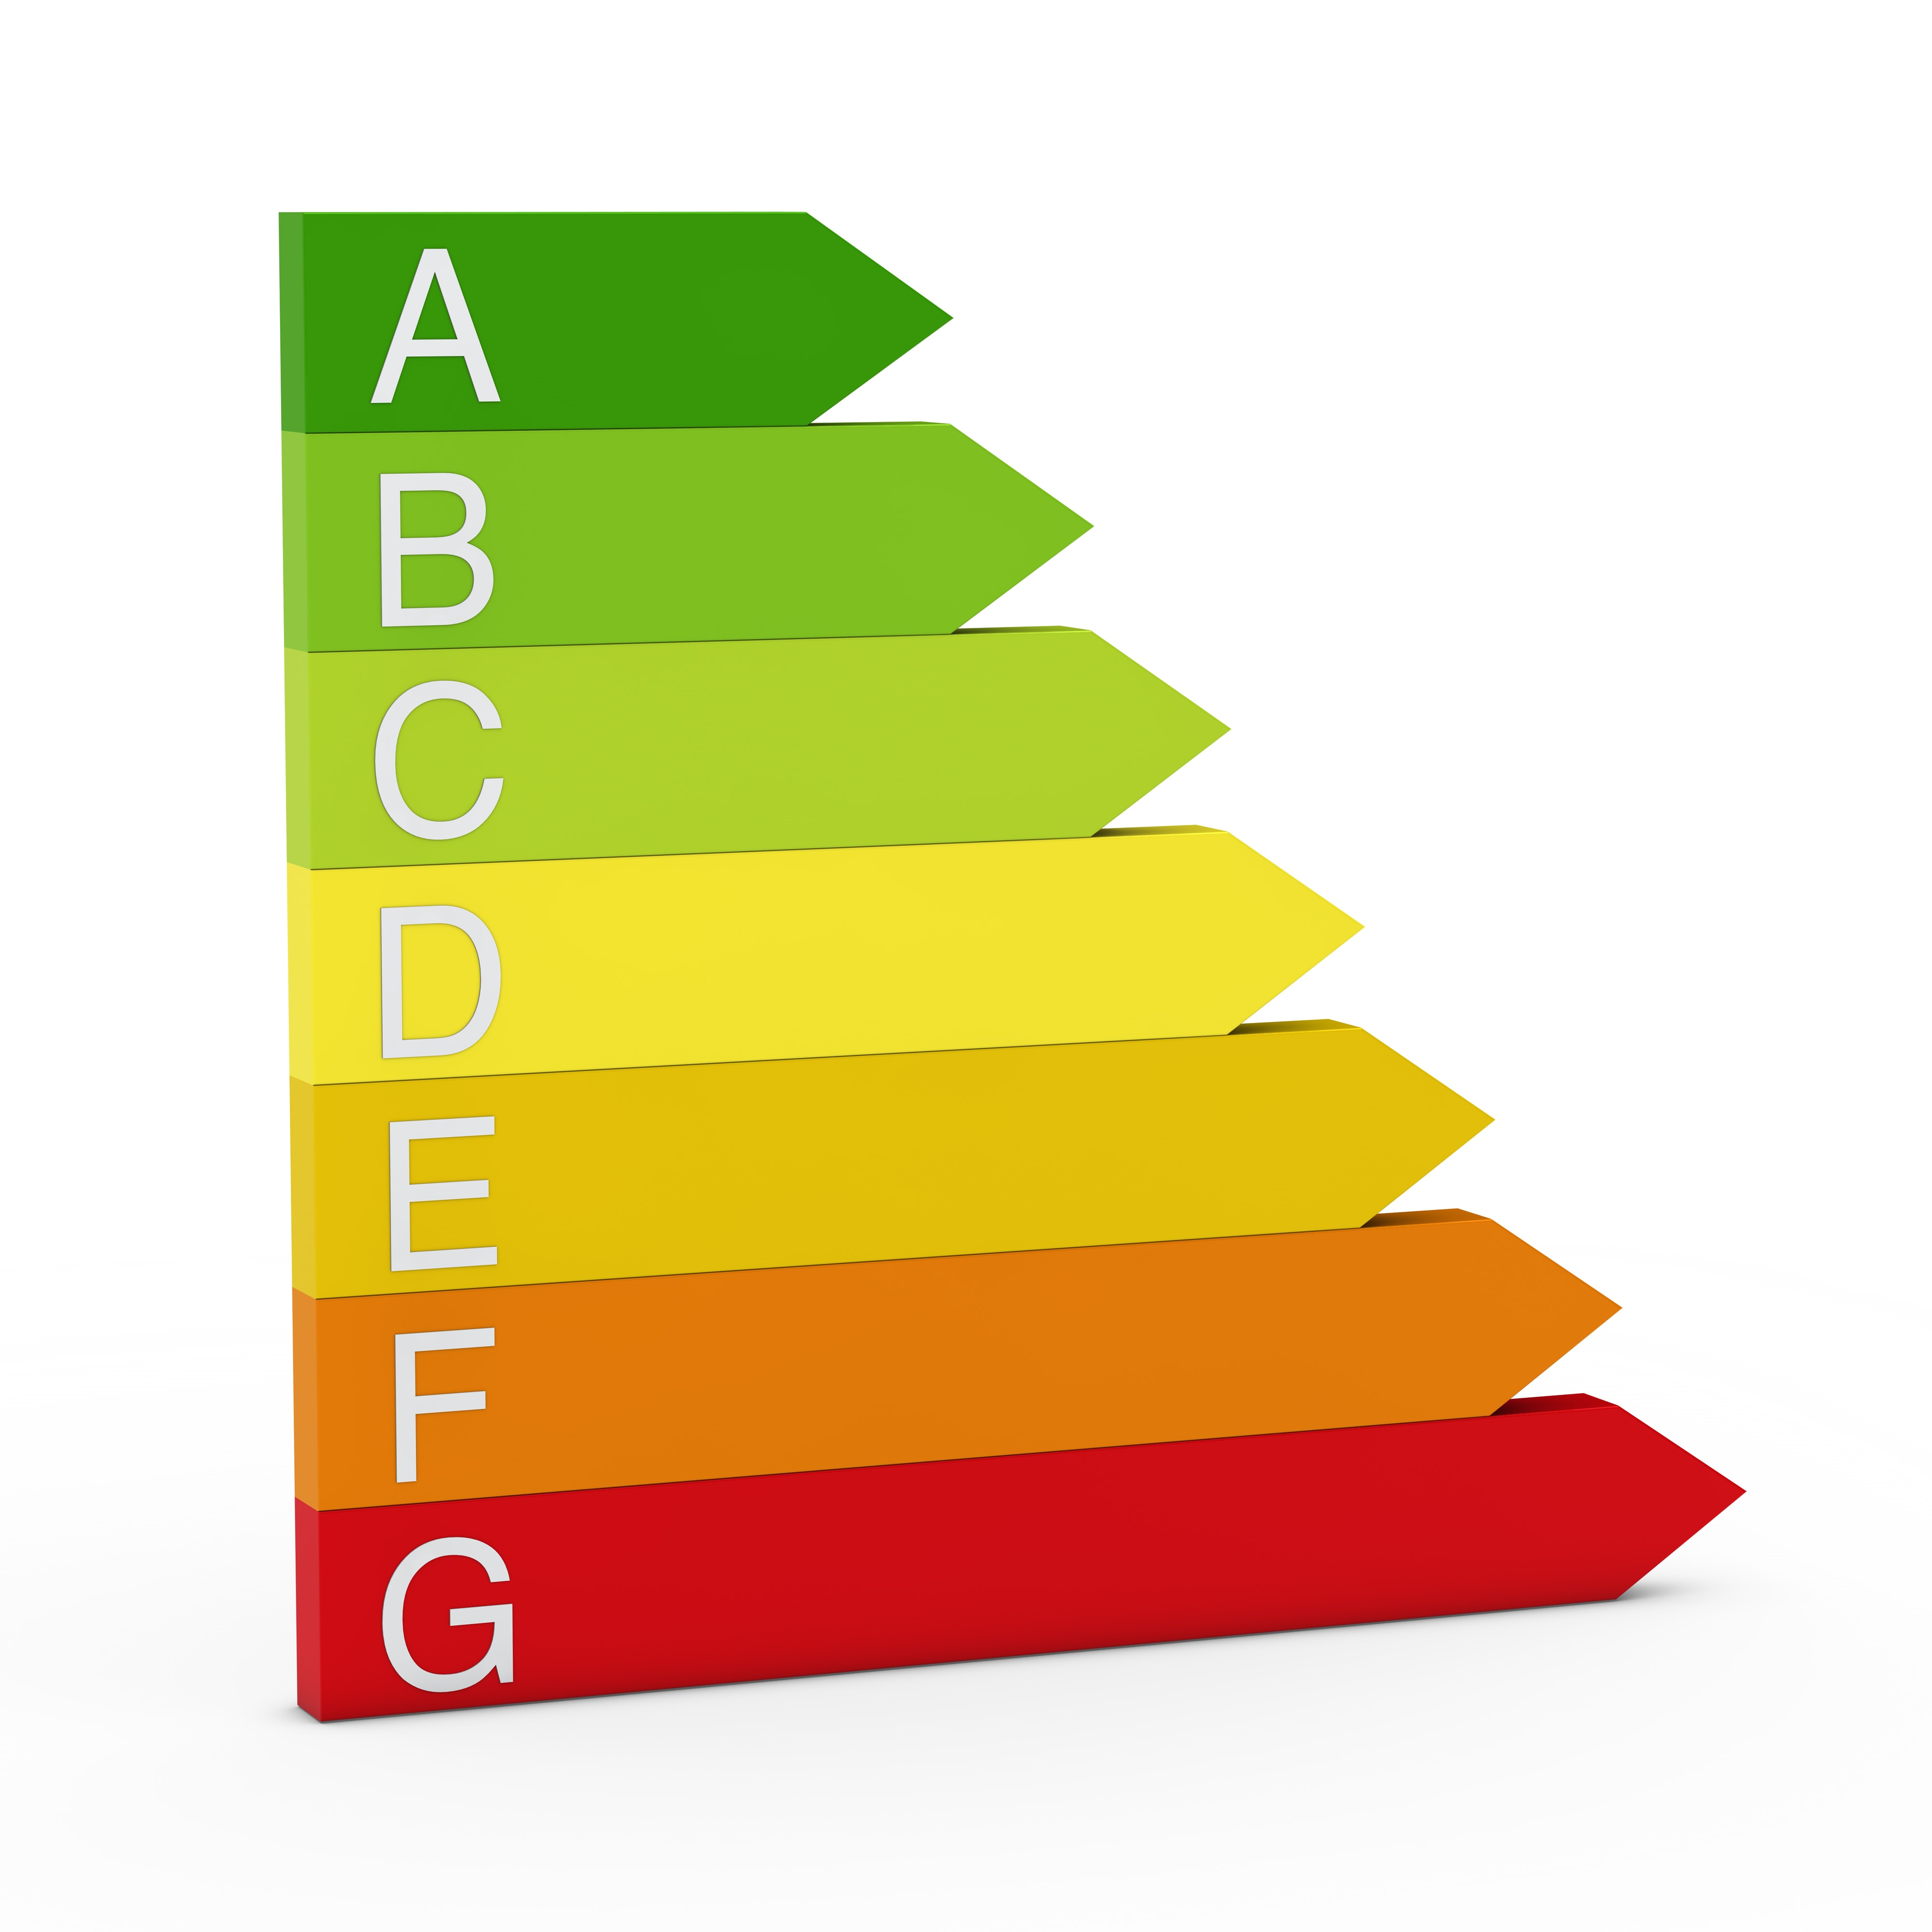 Wat is de betekenis van energielabel A